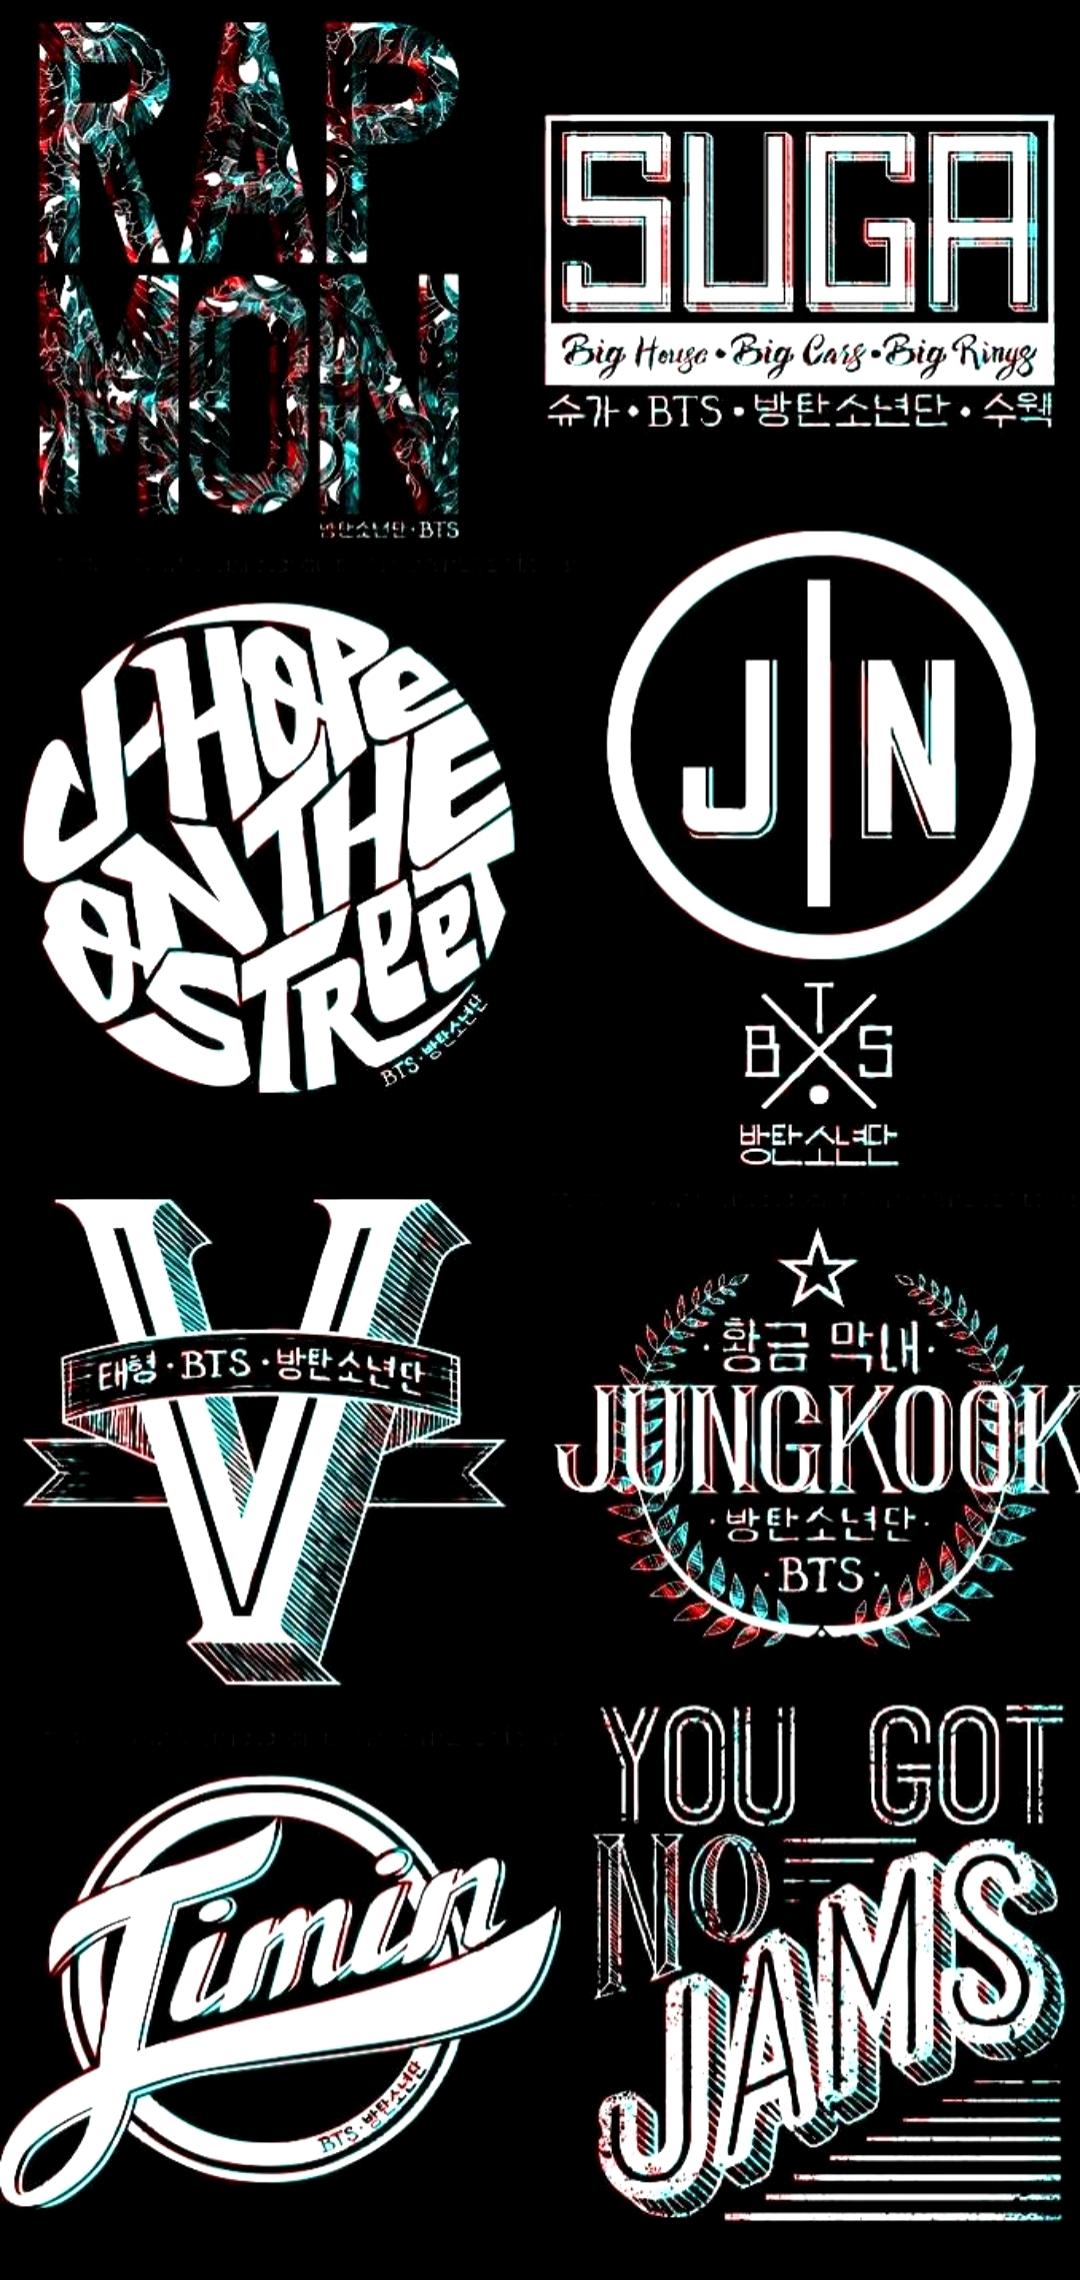 BTS Wallpaper For iPhone 8 Plus